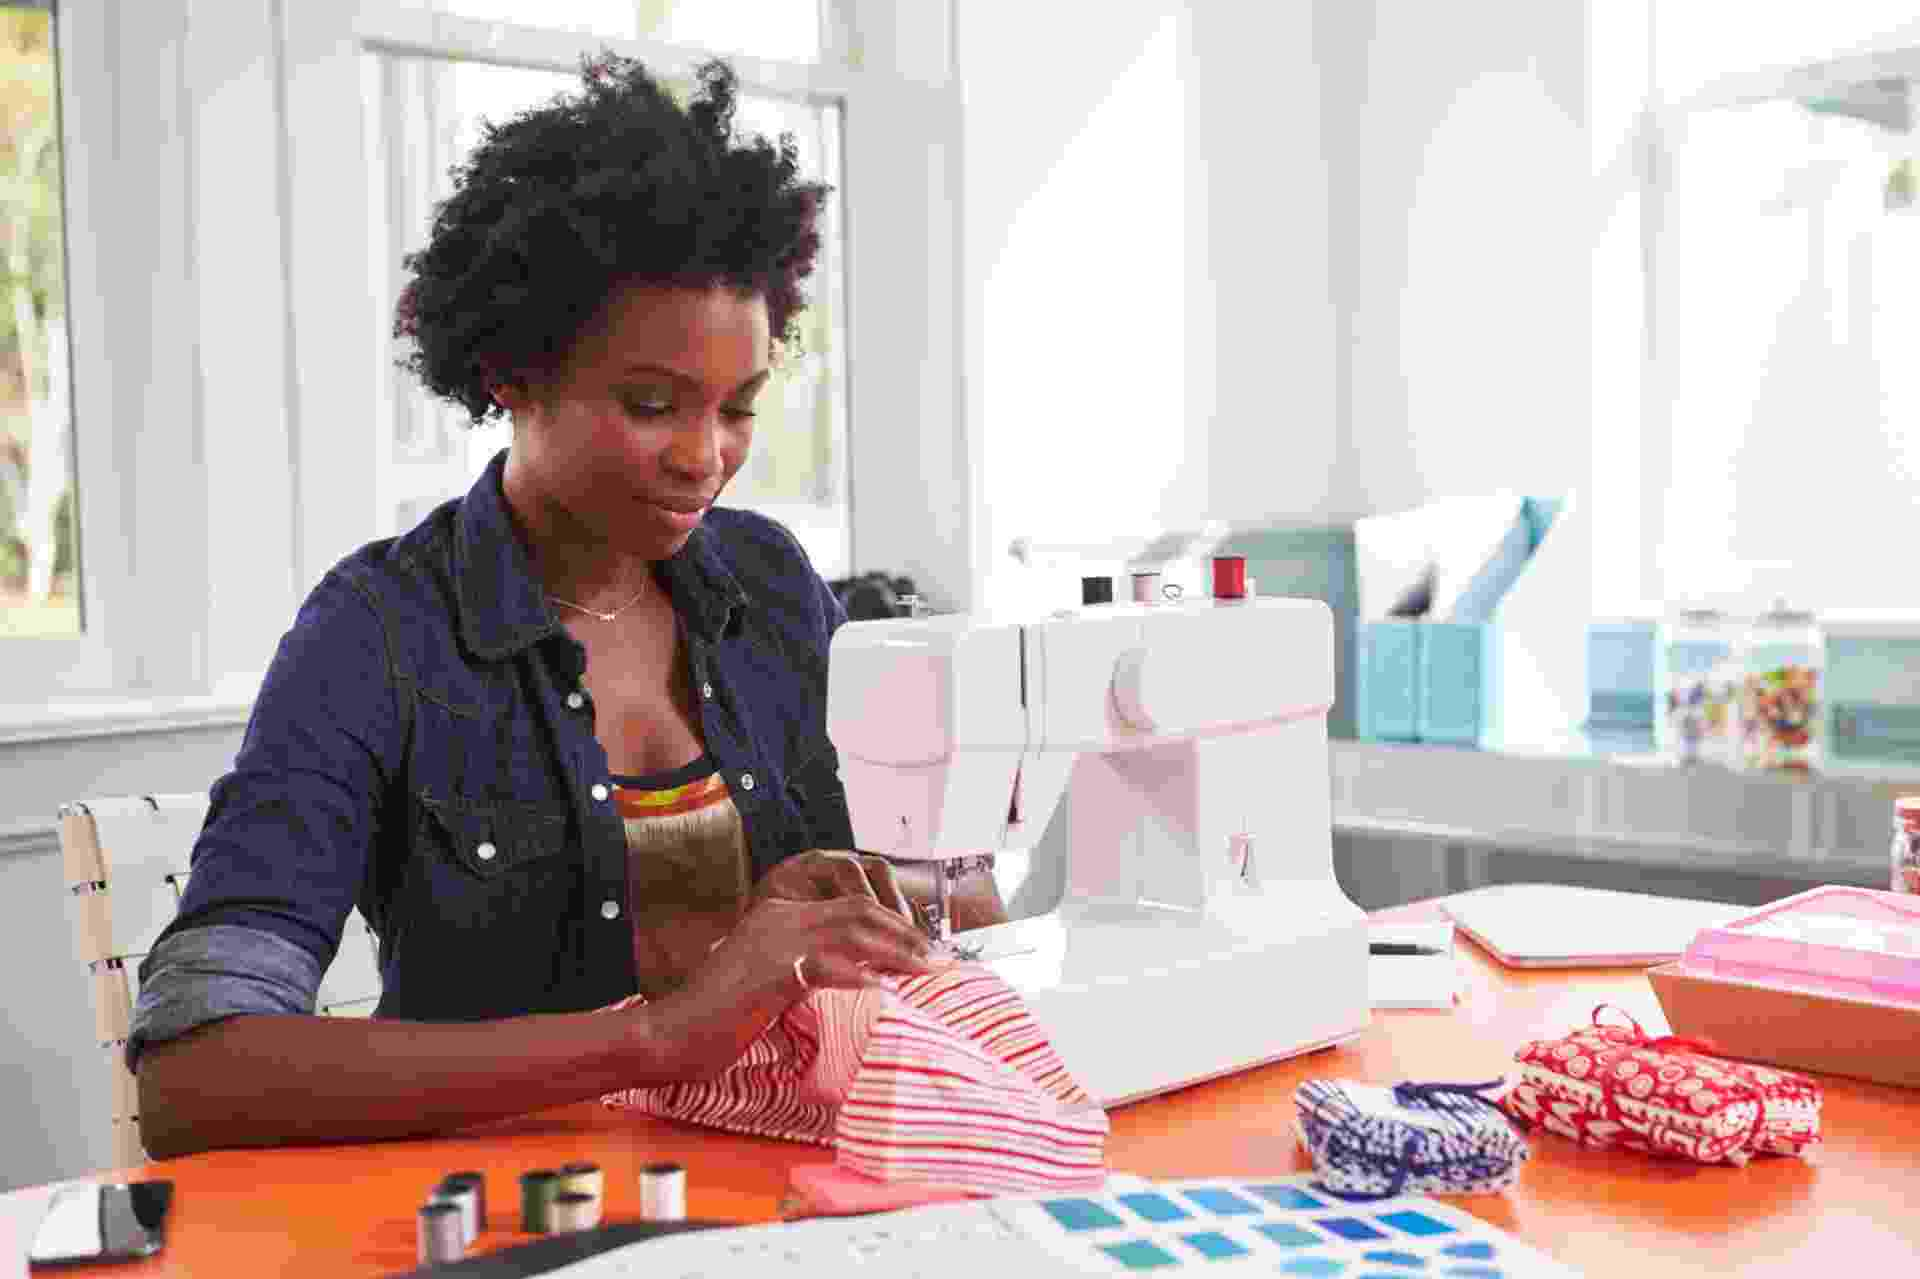 reparos em roupas, costura, costureira, serviços - Getty Images/iStockphoto